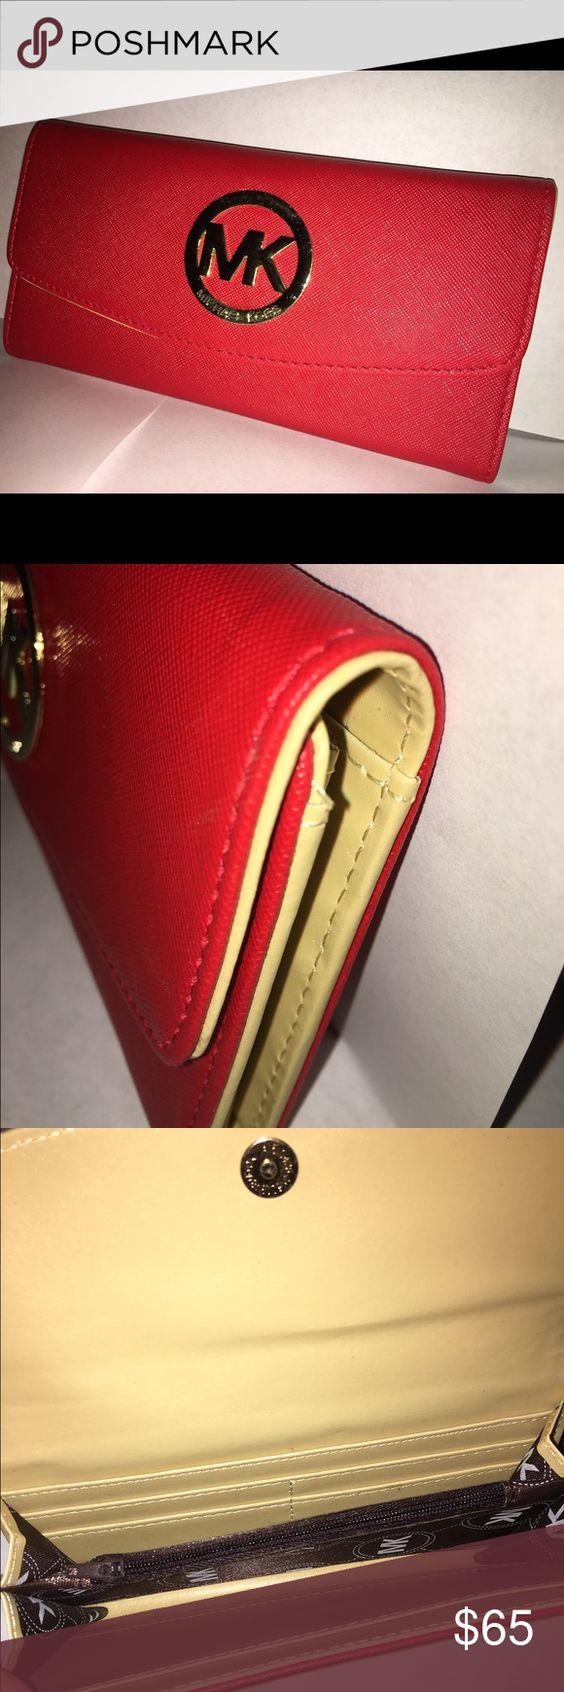 Women's MK Wallet 💞 Brand new Woman's fashionable Wallet 💞 Michael Kors Bags Wallets